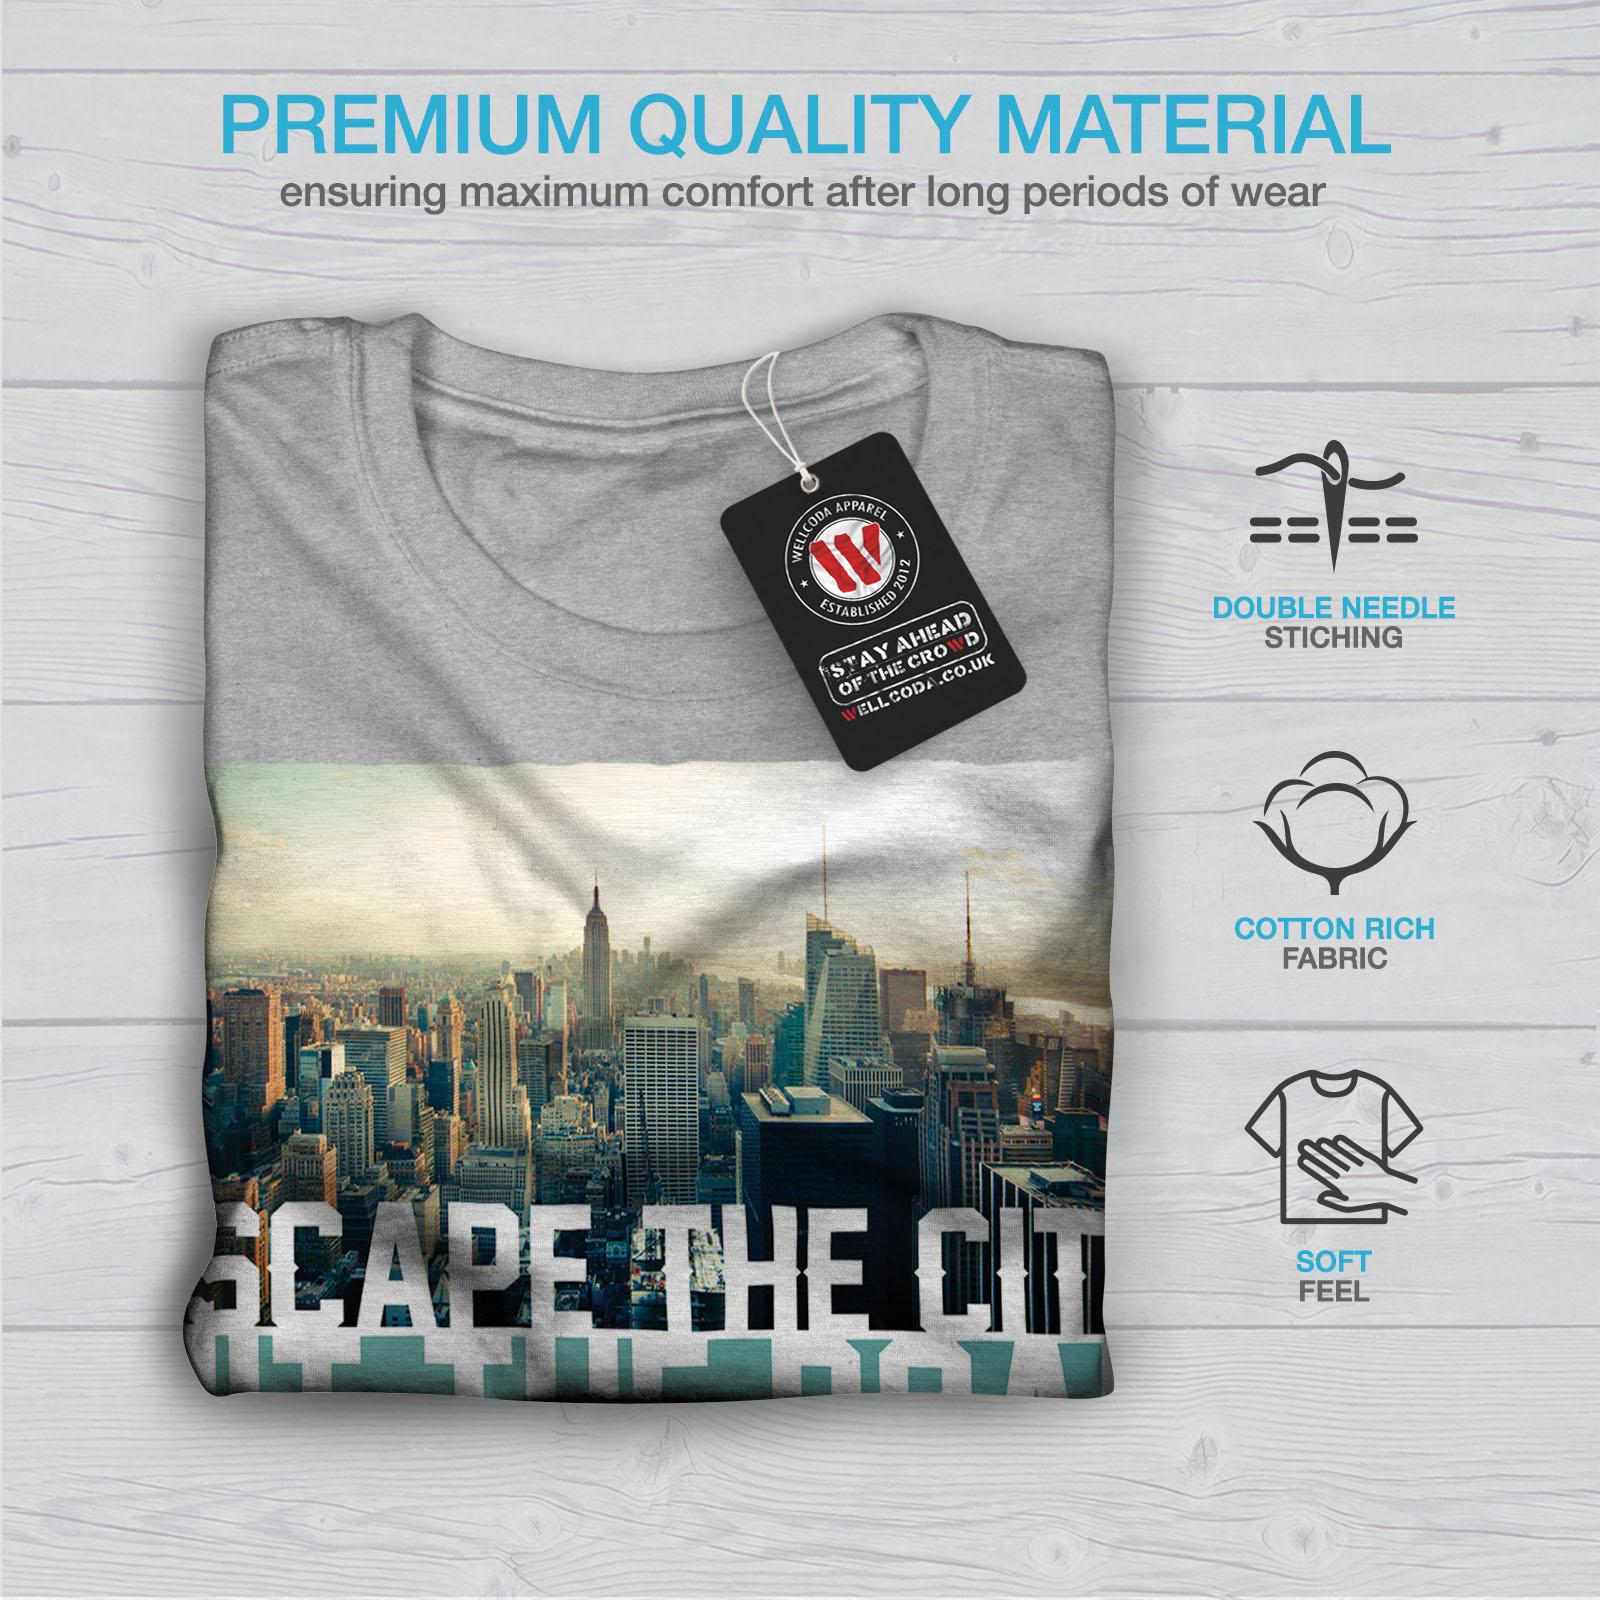 Wellcoda-Escape-The-City-Herren-T-Shirt-Lifestyle-Grafikdesign-Printed-Tee Indexbild 19